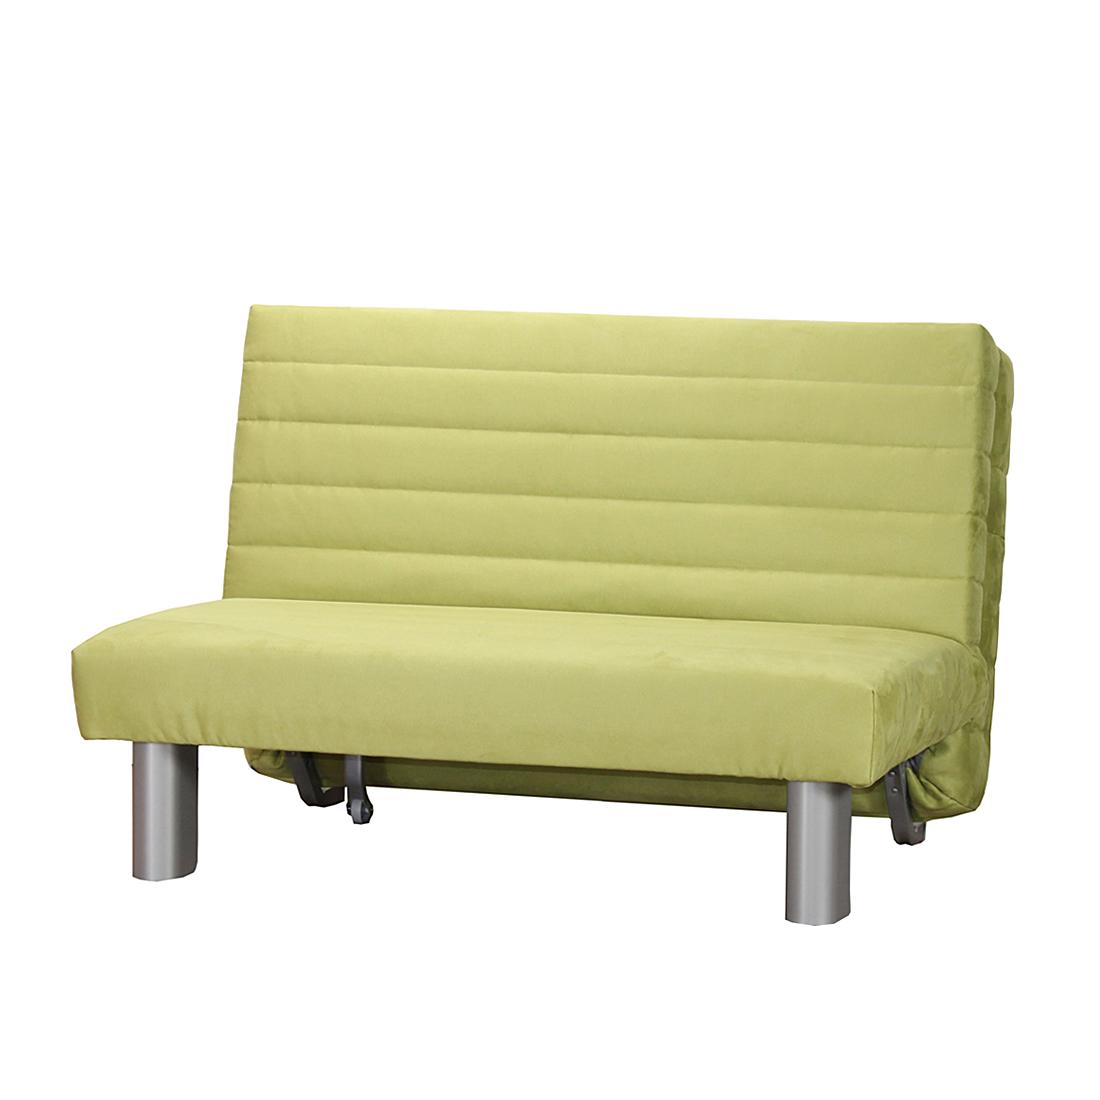 schlafsofa 120 cm breit m belideen. Black Bedroom Furniture Sets. Home Design Ideas